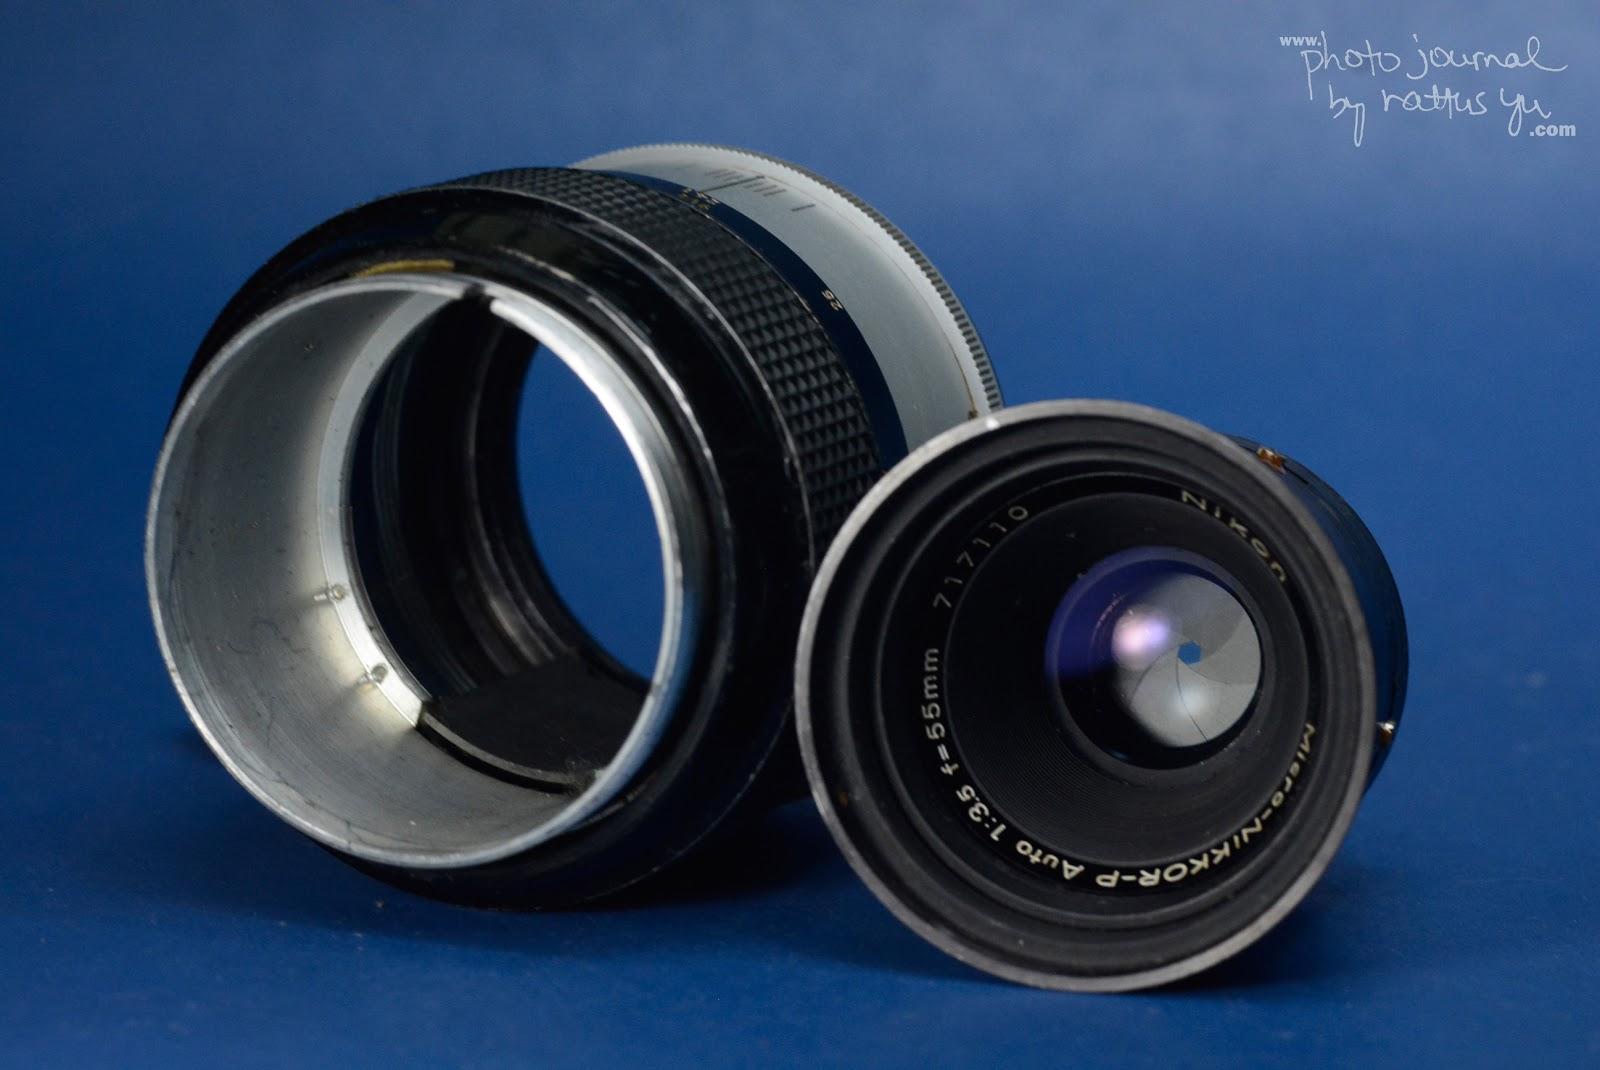 Micro-Nikkor-P 55mm f/3.5 (Pre-AI Version), Serial# 717110 of 1974